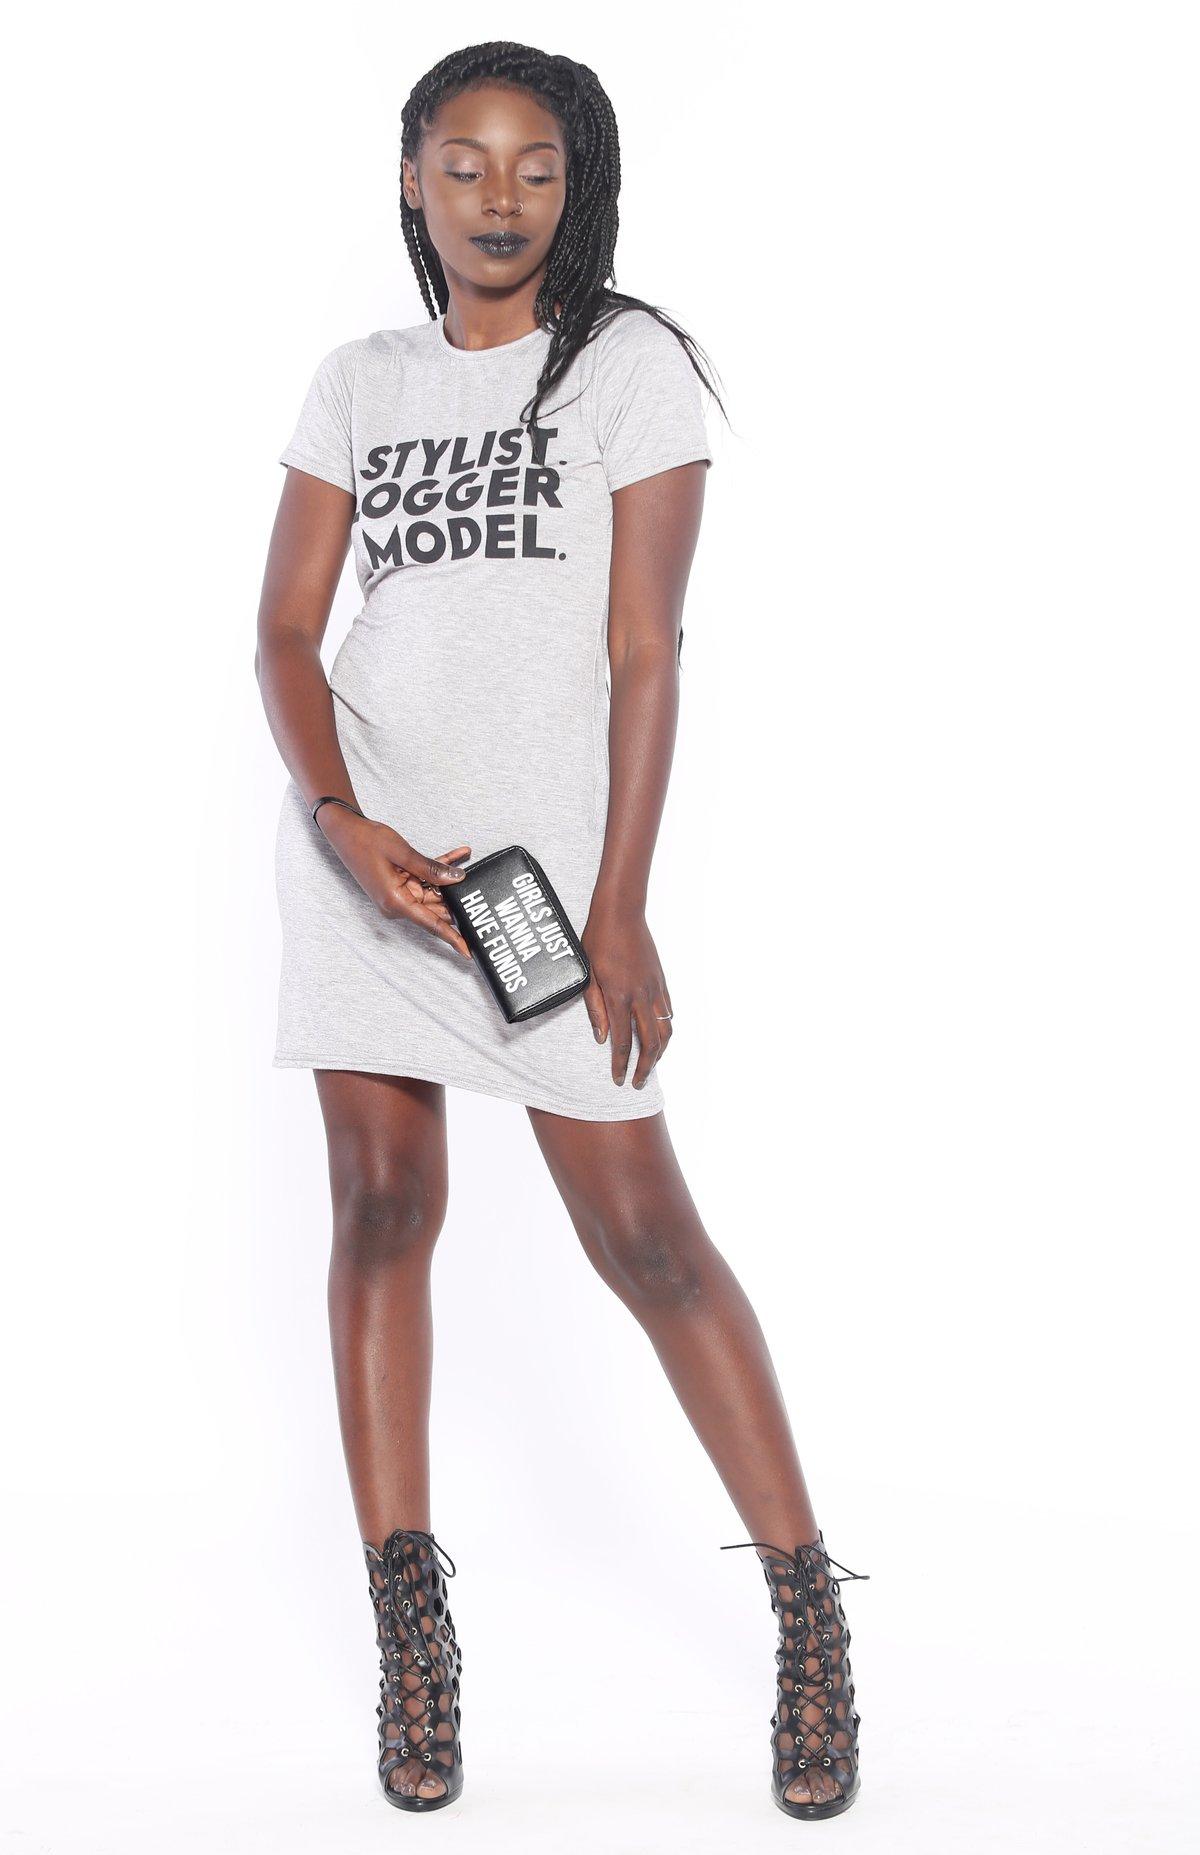 Image of Stylist Model Blogger T-Shirt Dress